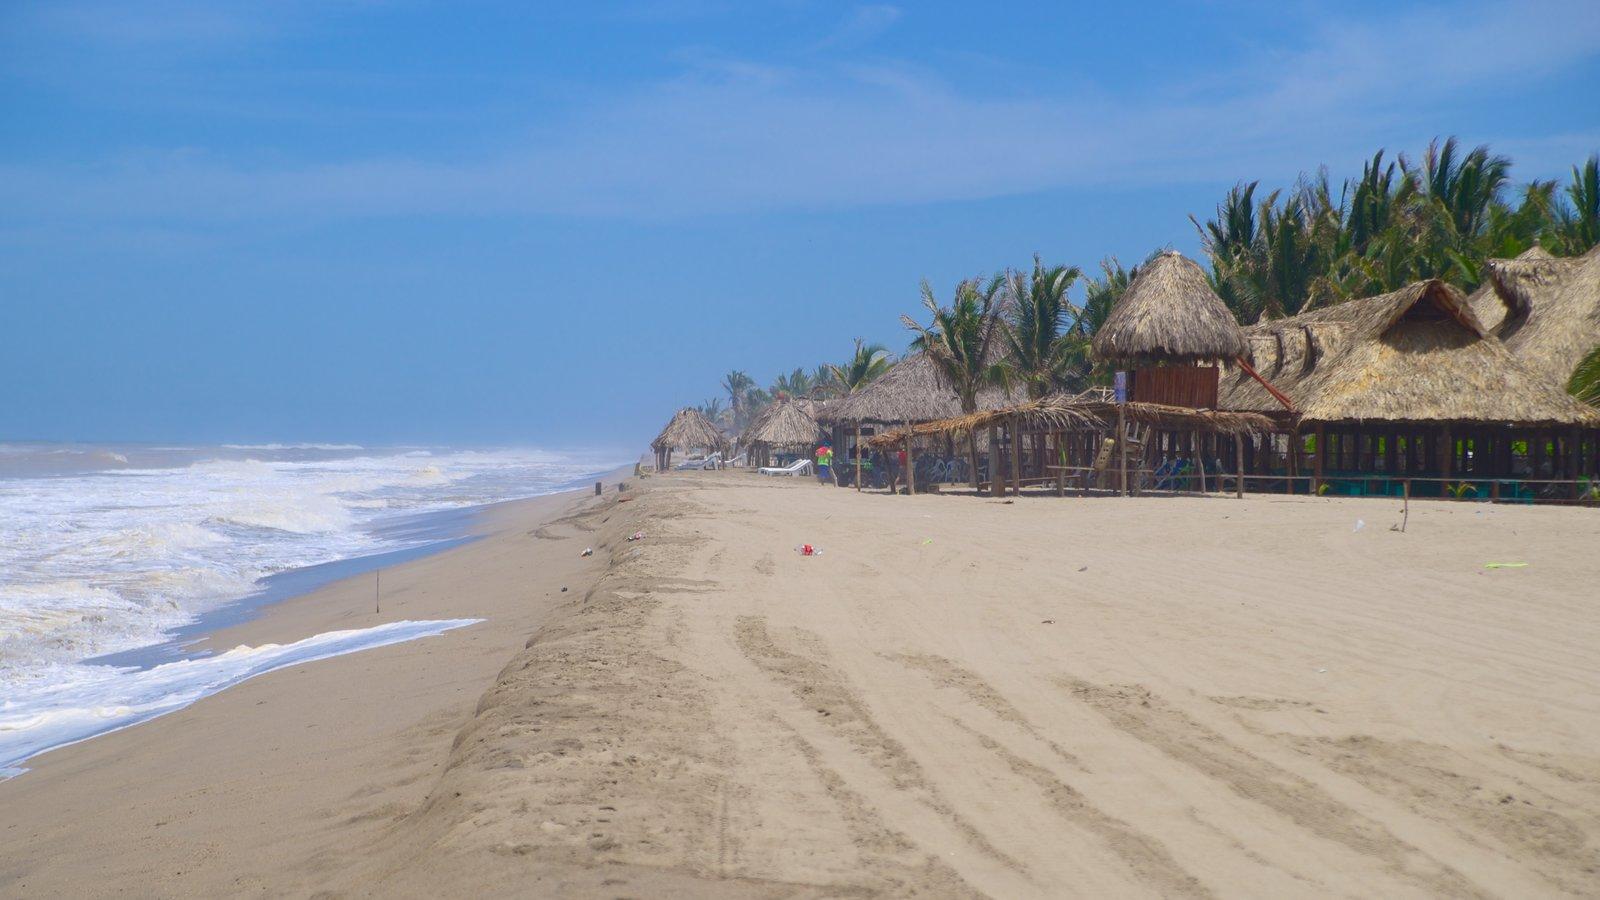 Playa De Barra Vieja Showing A Coastal Town And Sandy Beach